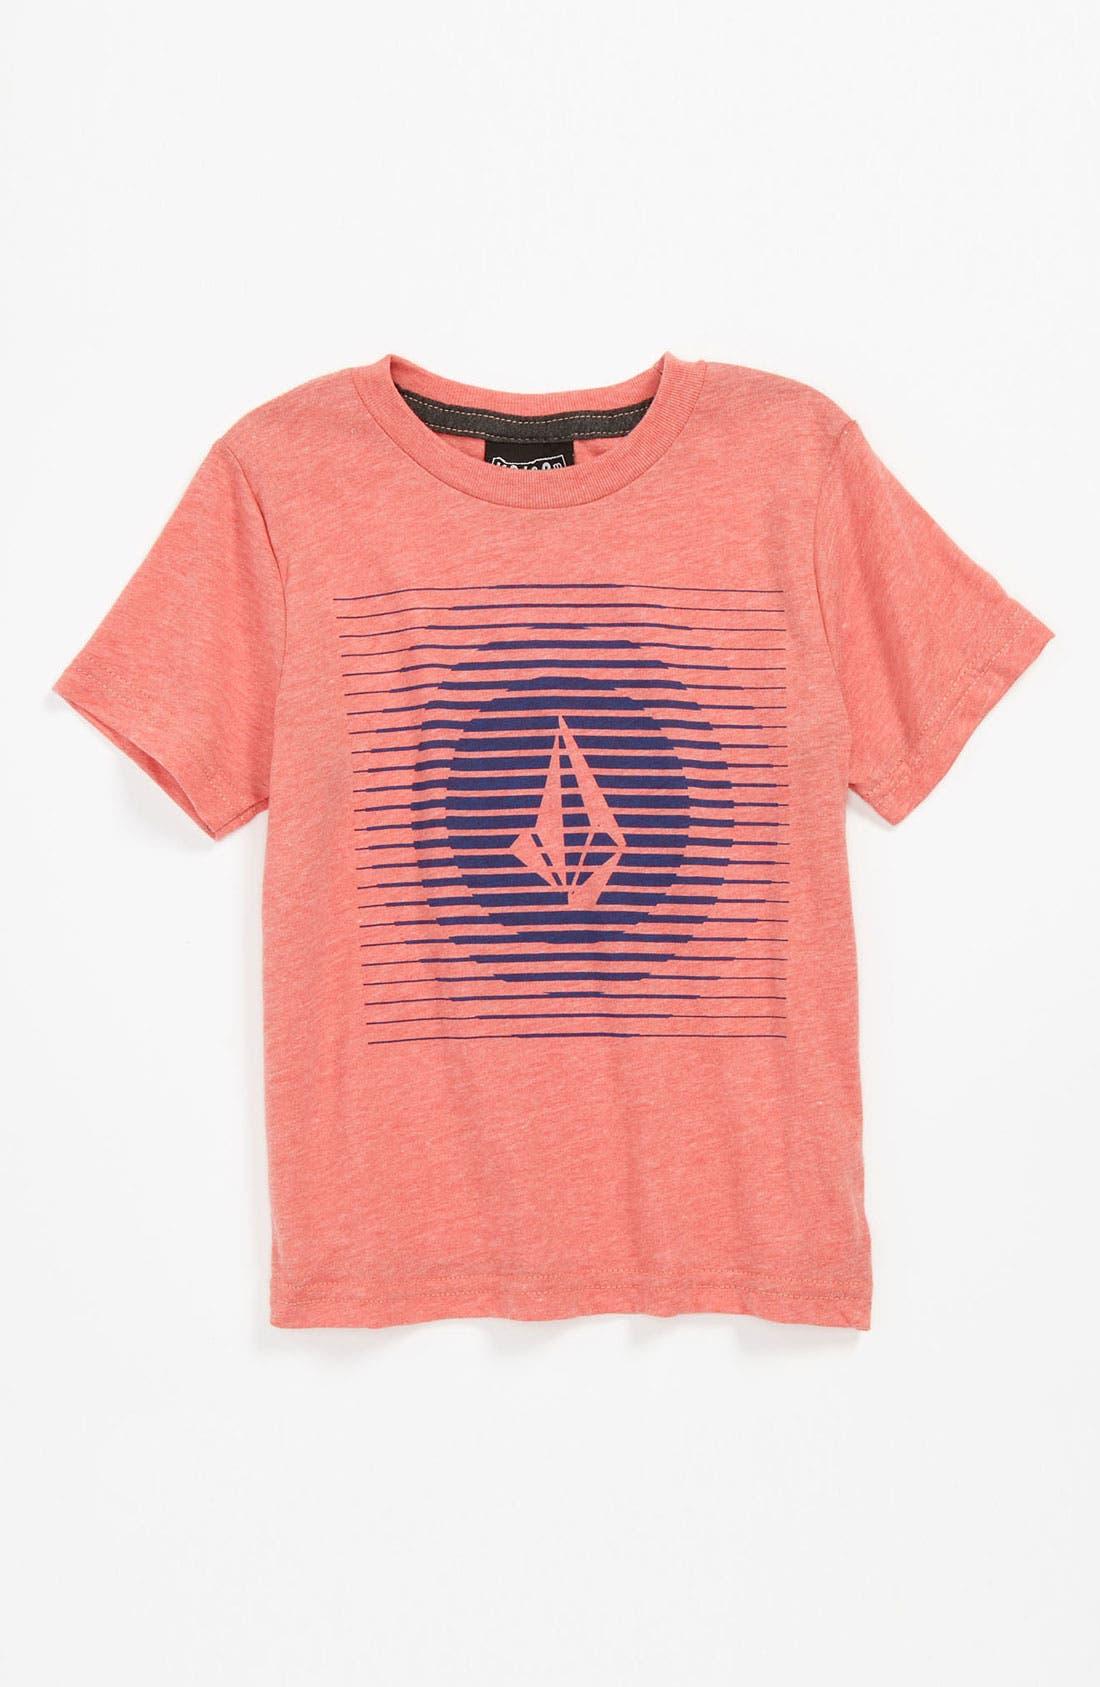 Main Image - Volcom 'Opticalill' T-Shirt (Toddler)